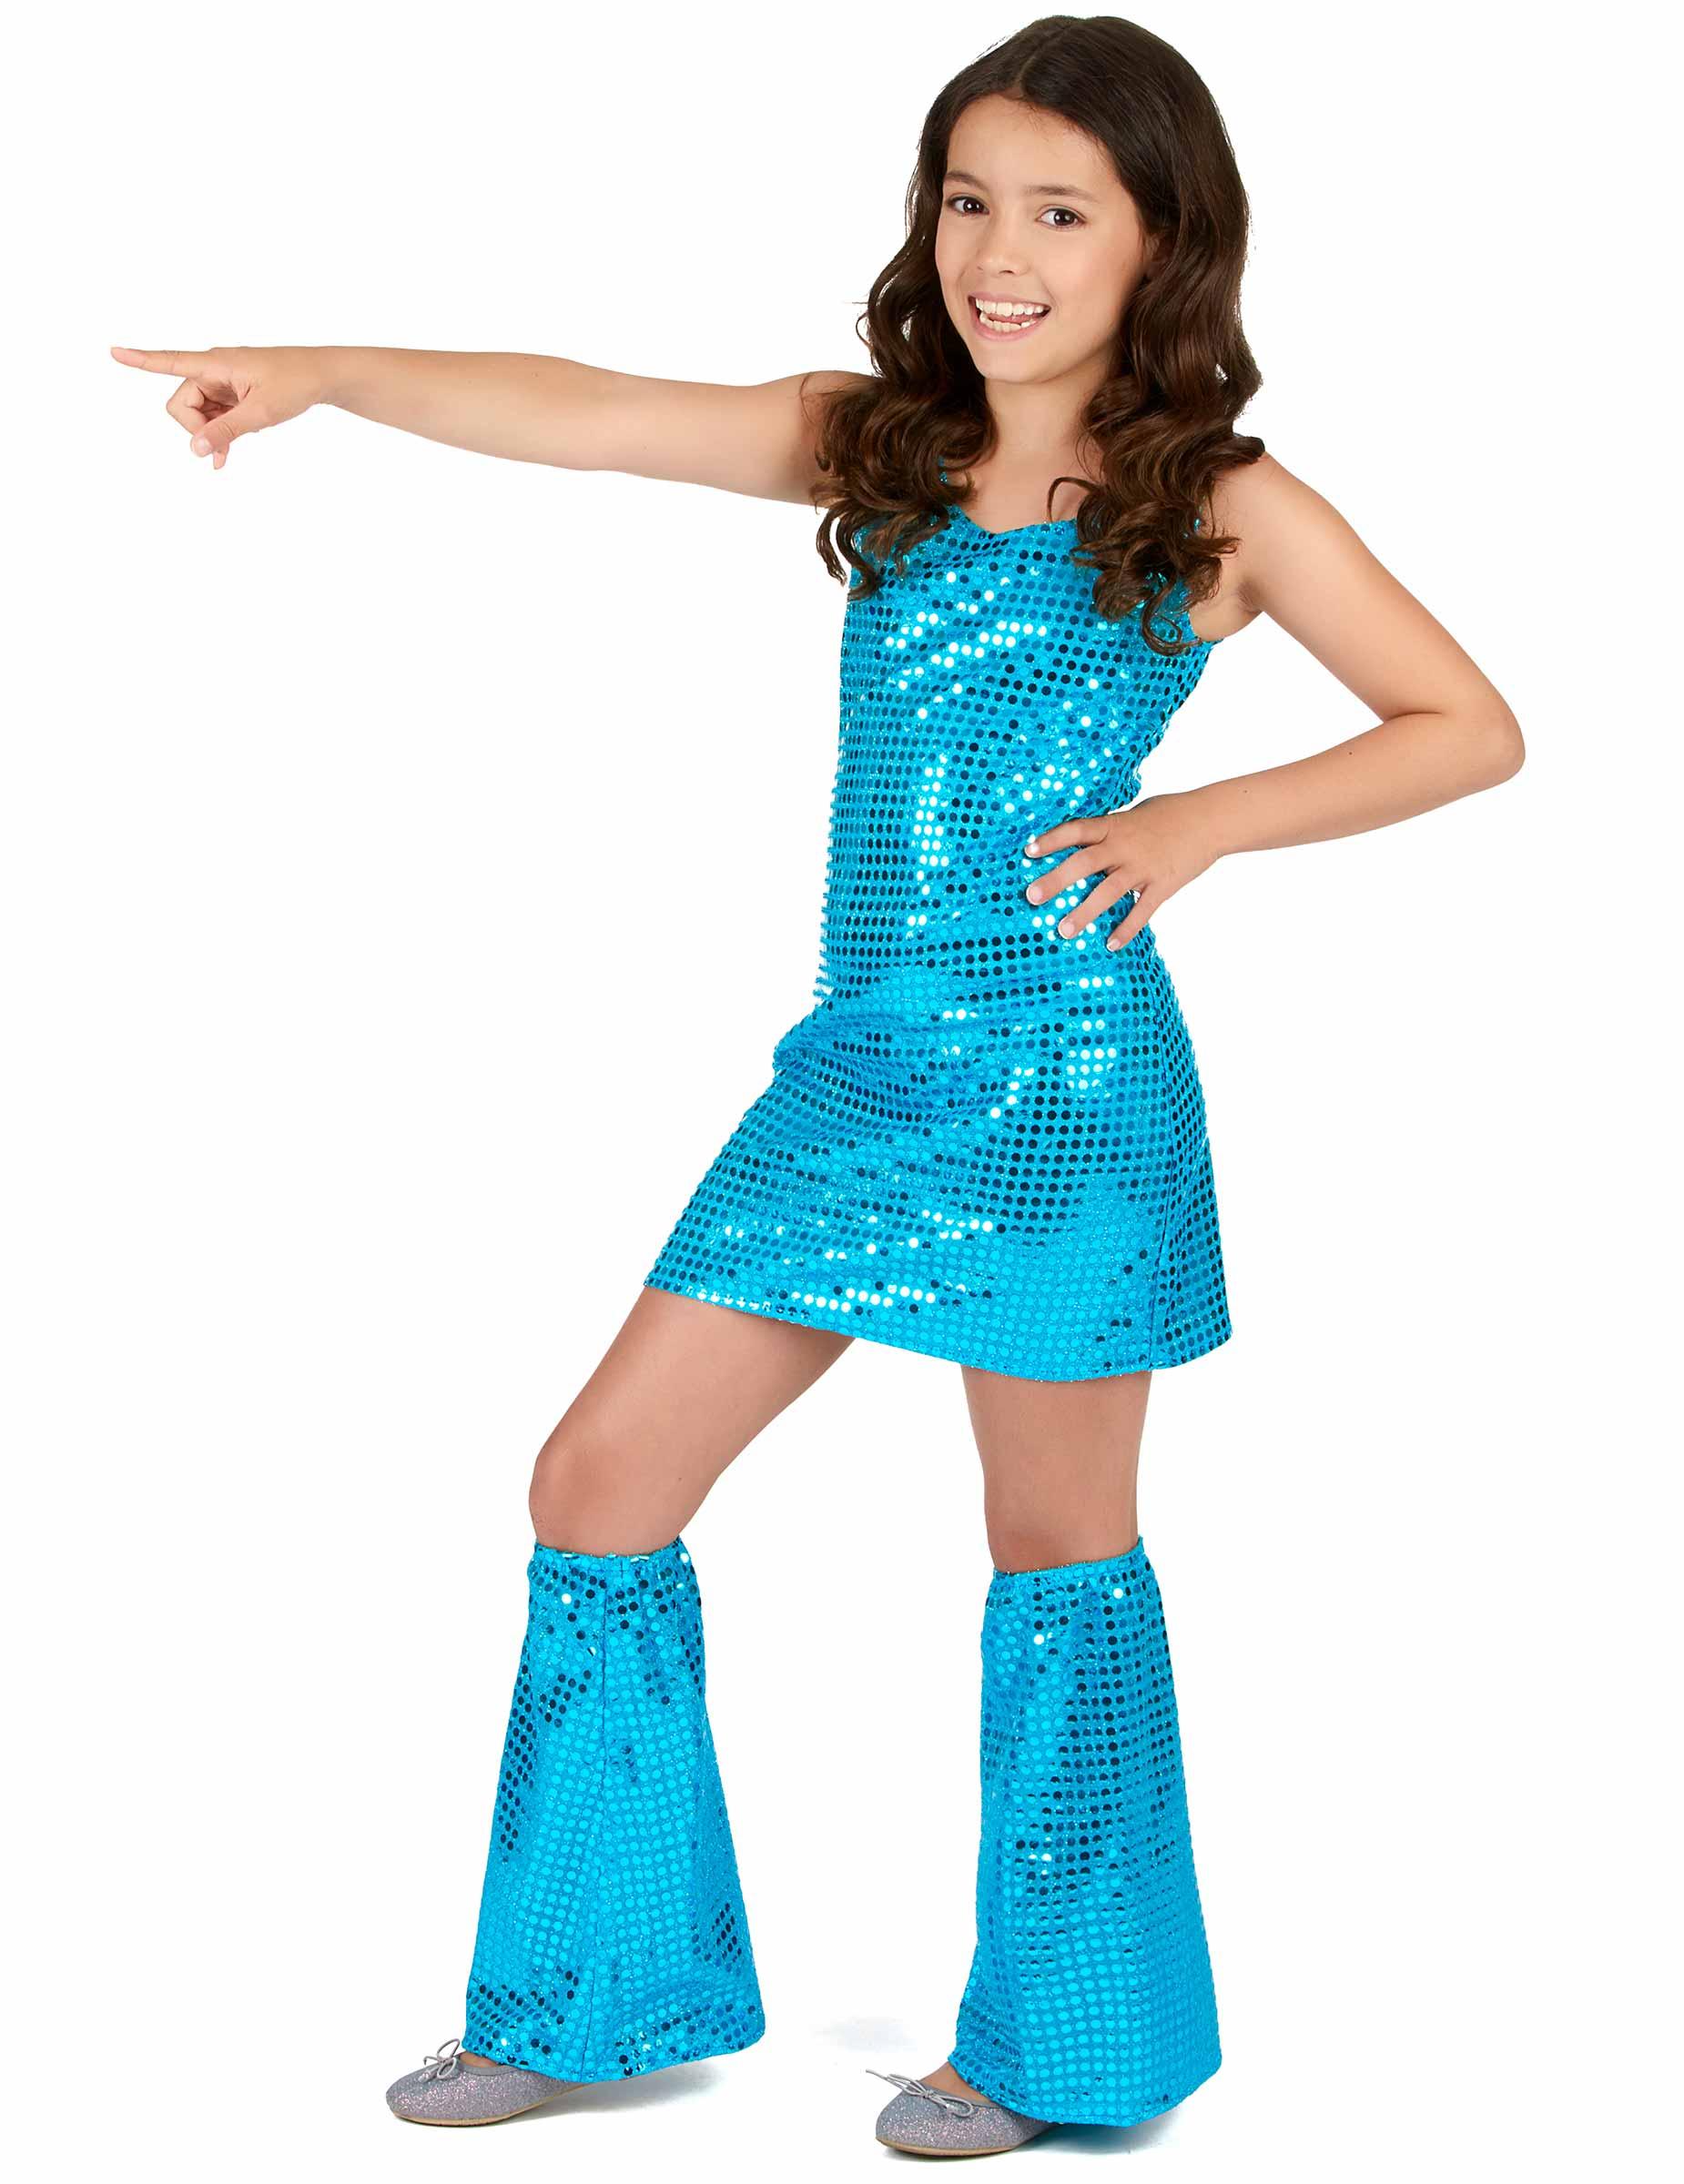 Déguisement Disco bleu turquoise fille   Deguise-toi 84f2fc85ced